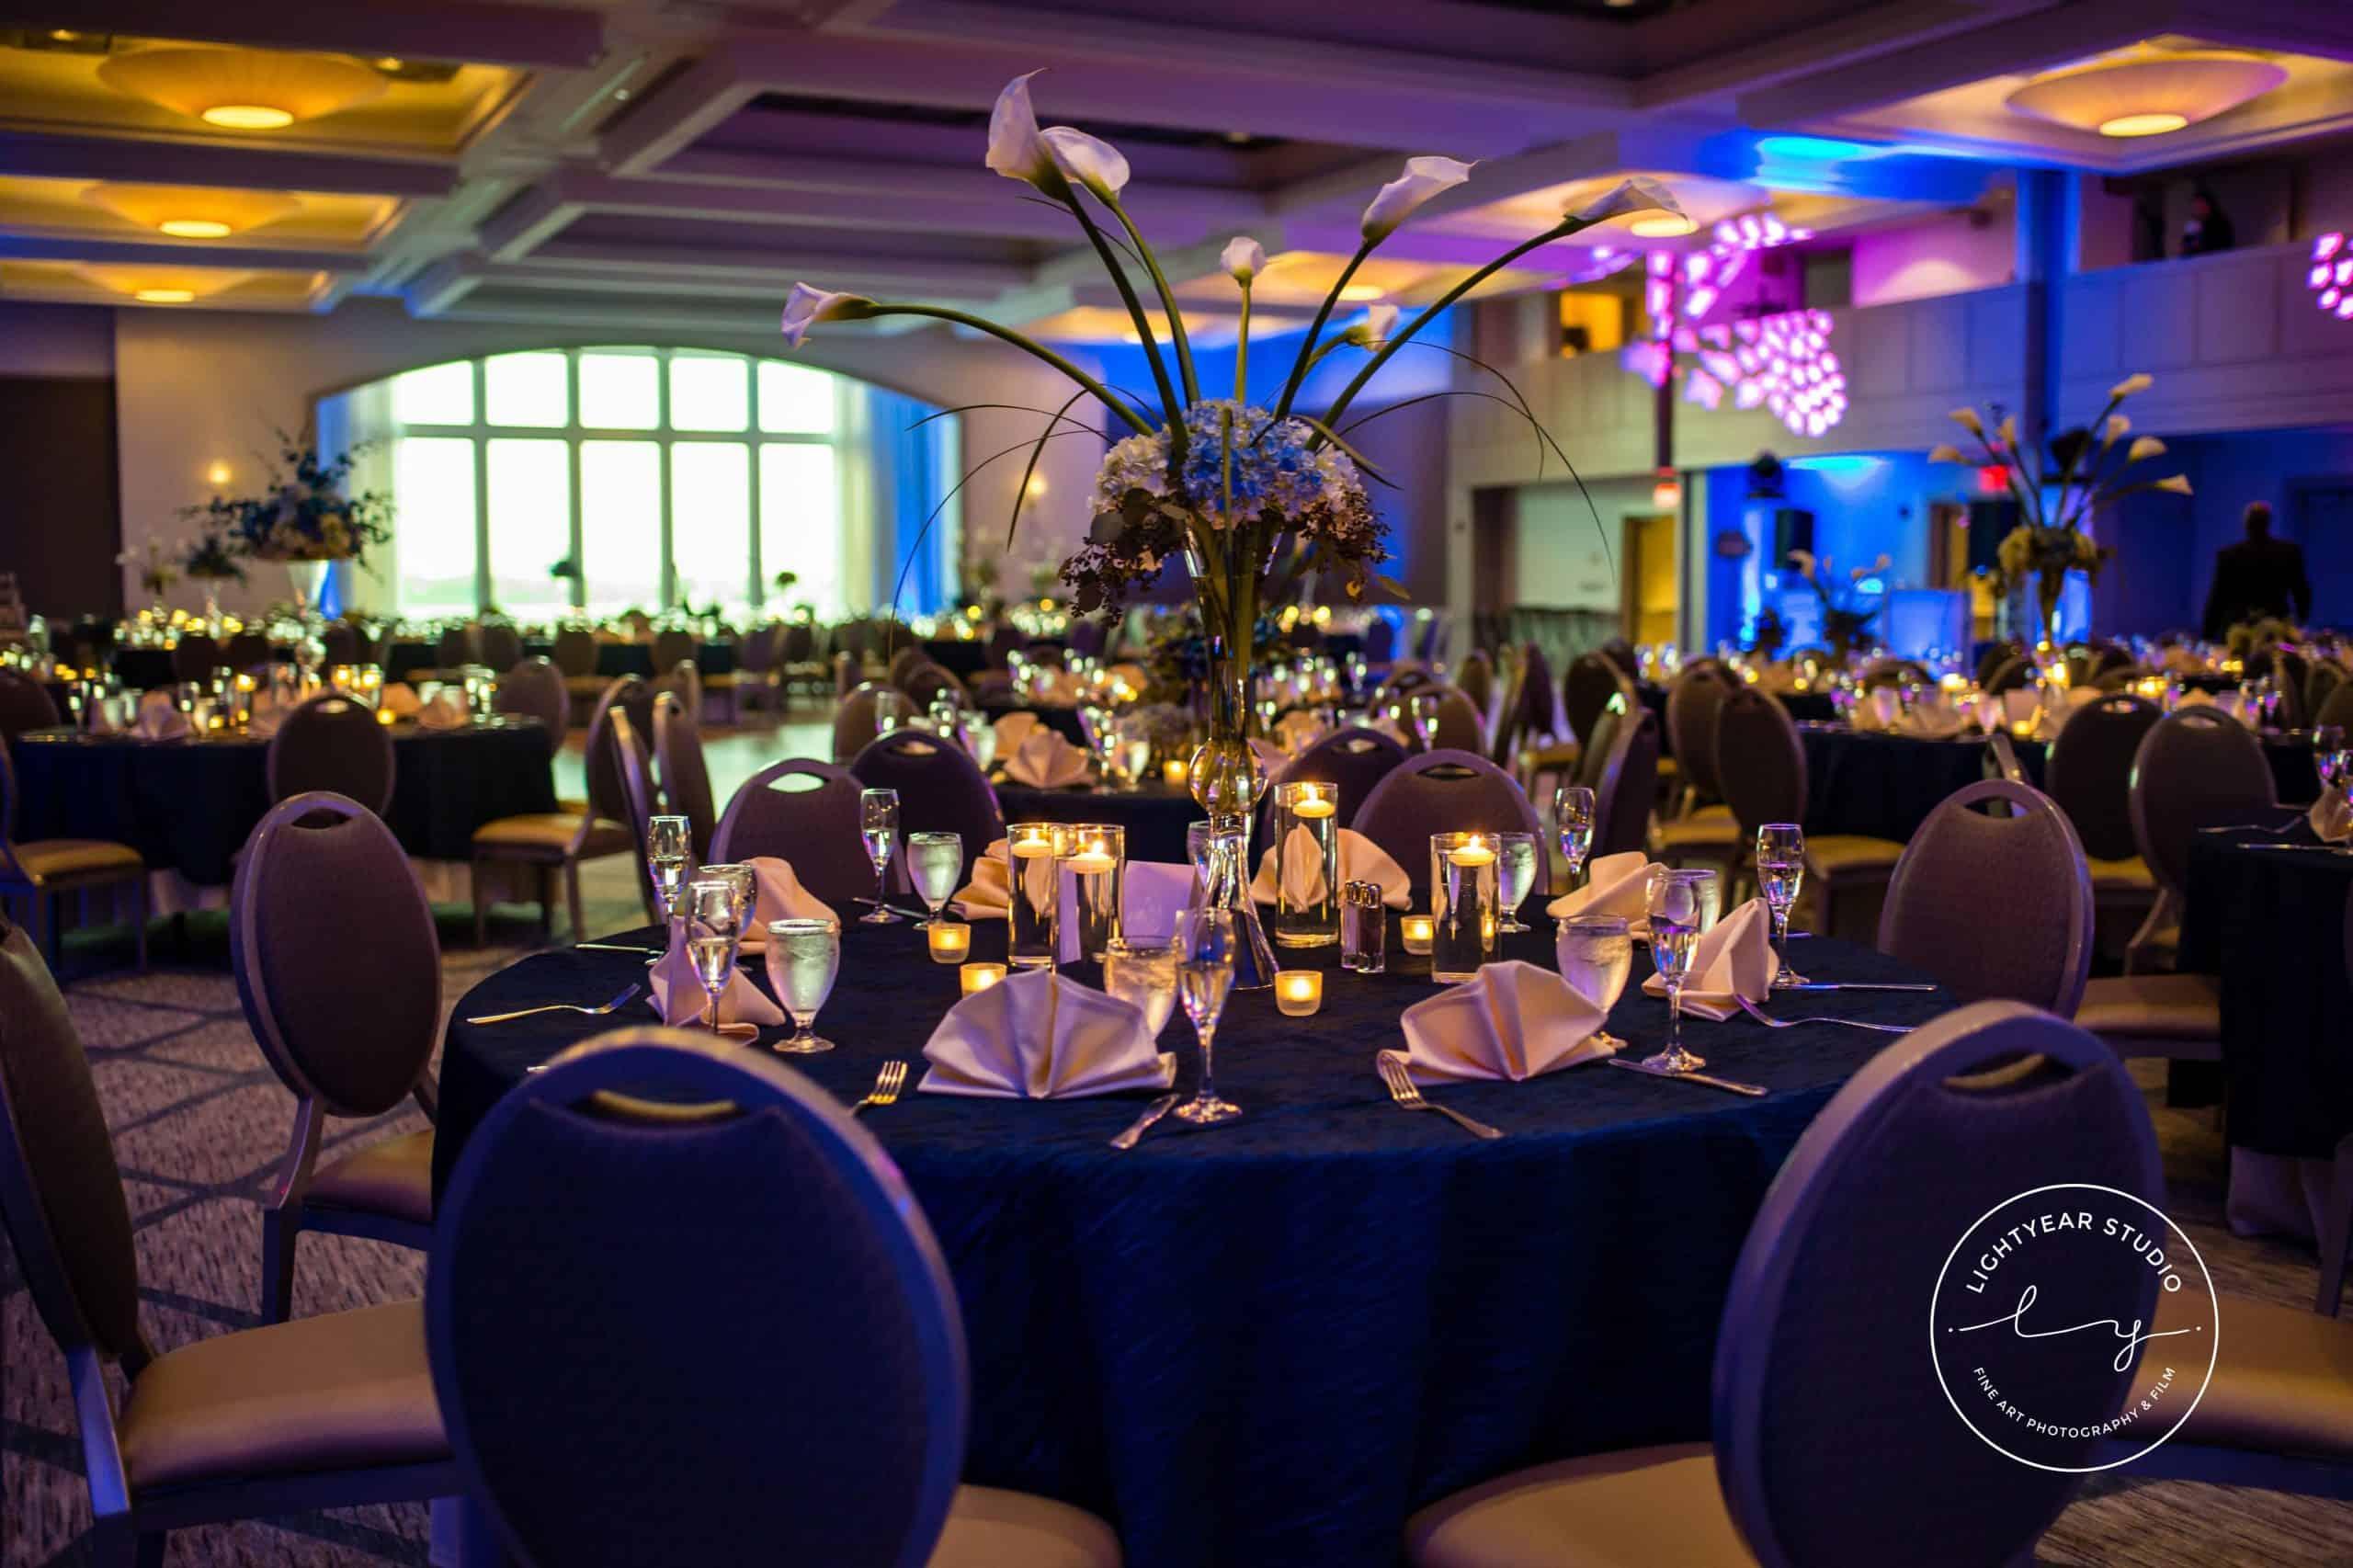 Indian Chinese Wedding Hilton Philadelphia at Penn_s Landing Elegant Events Philadelphia 14-1